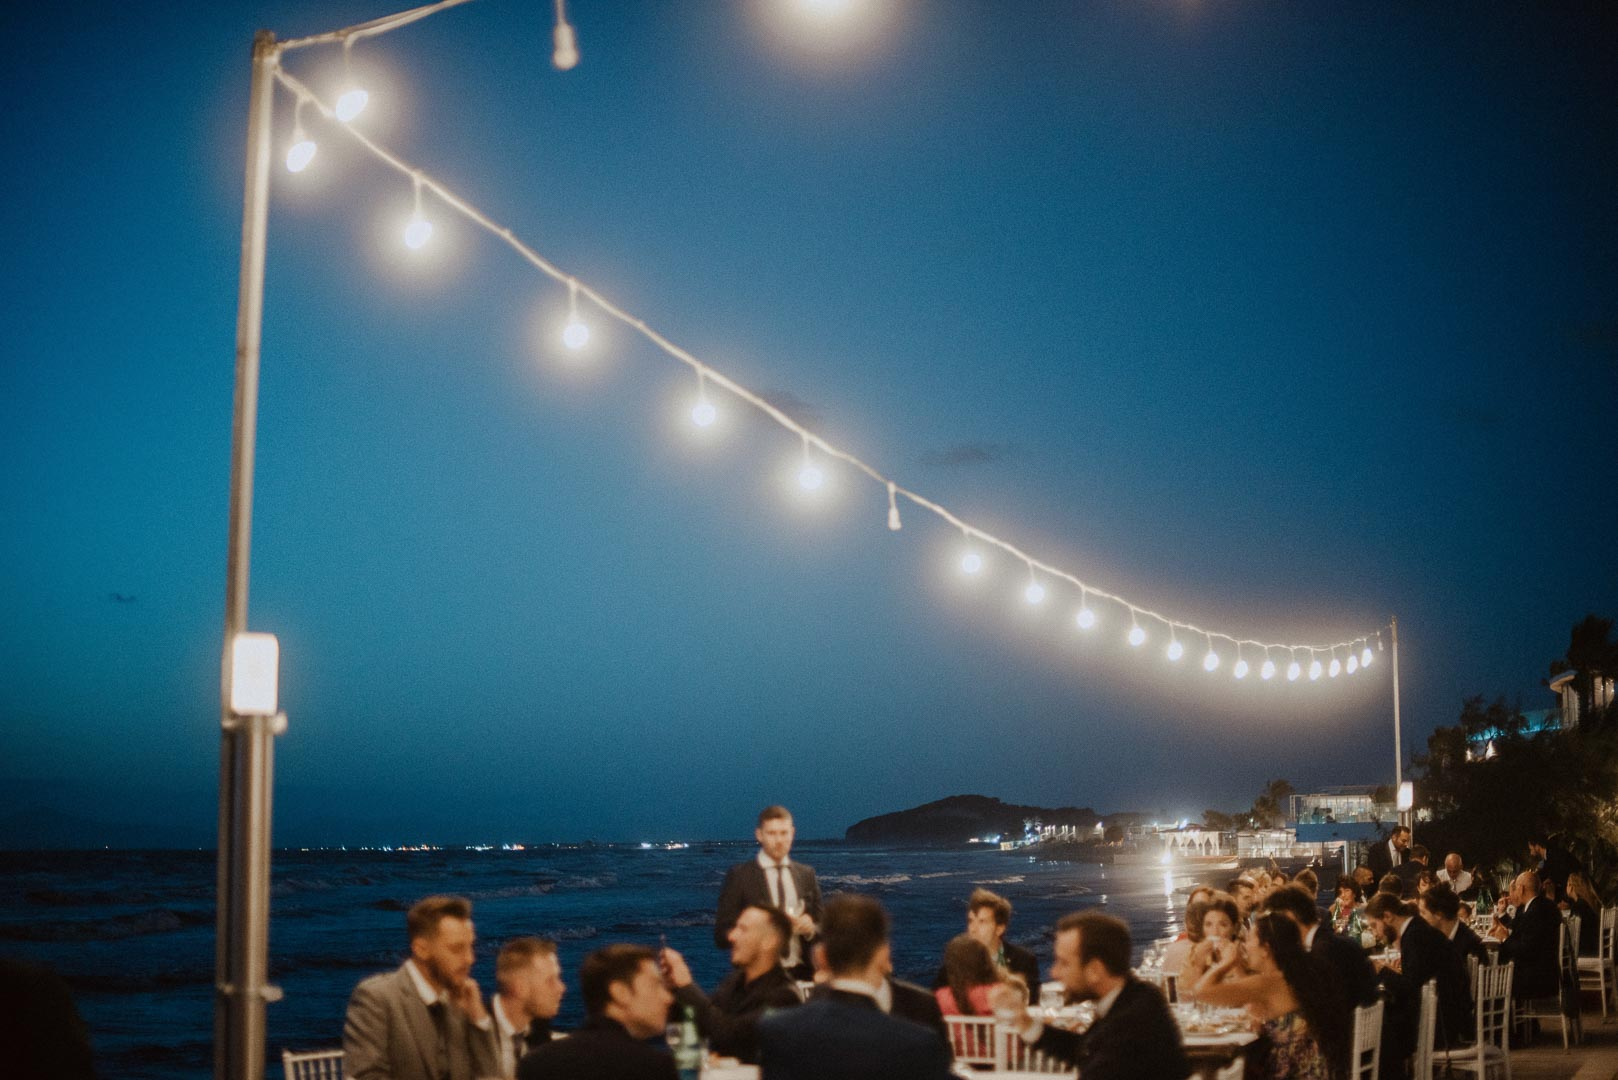 wedding-photographer-destination-fineart-bespoke-reportage-napoli-nabilah-vivianeizzo-spazio46-149